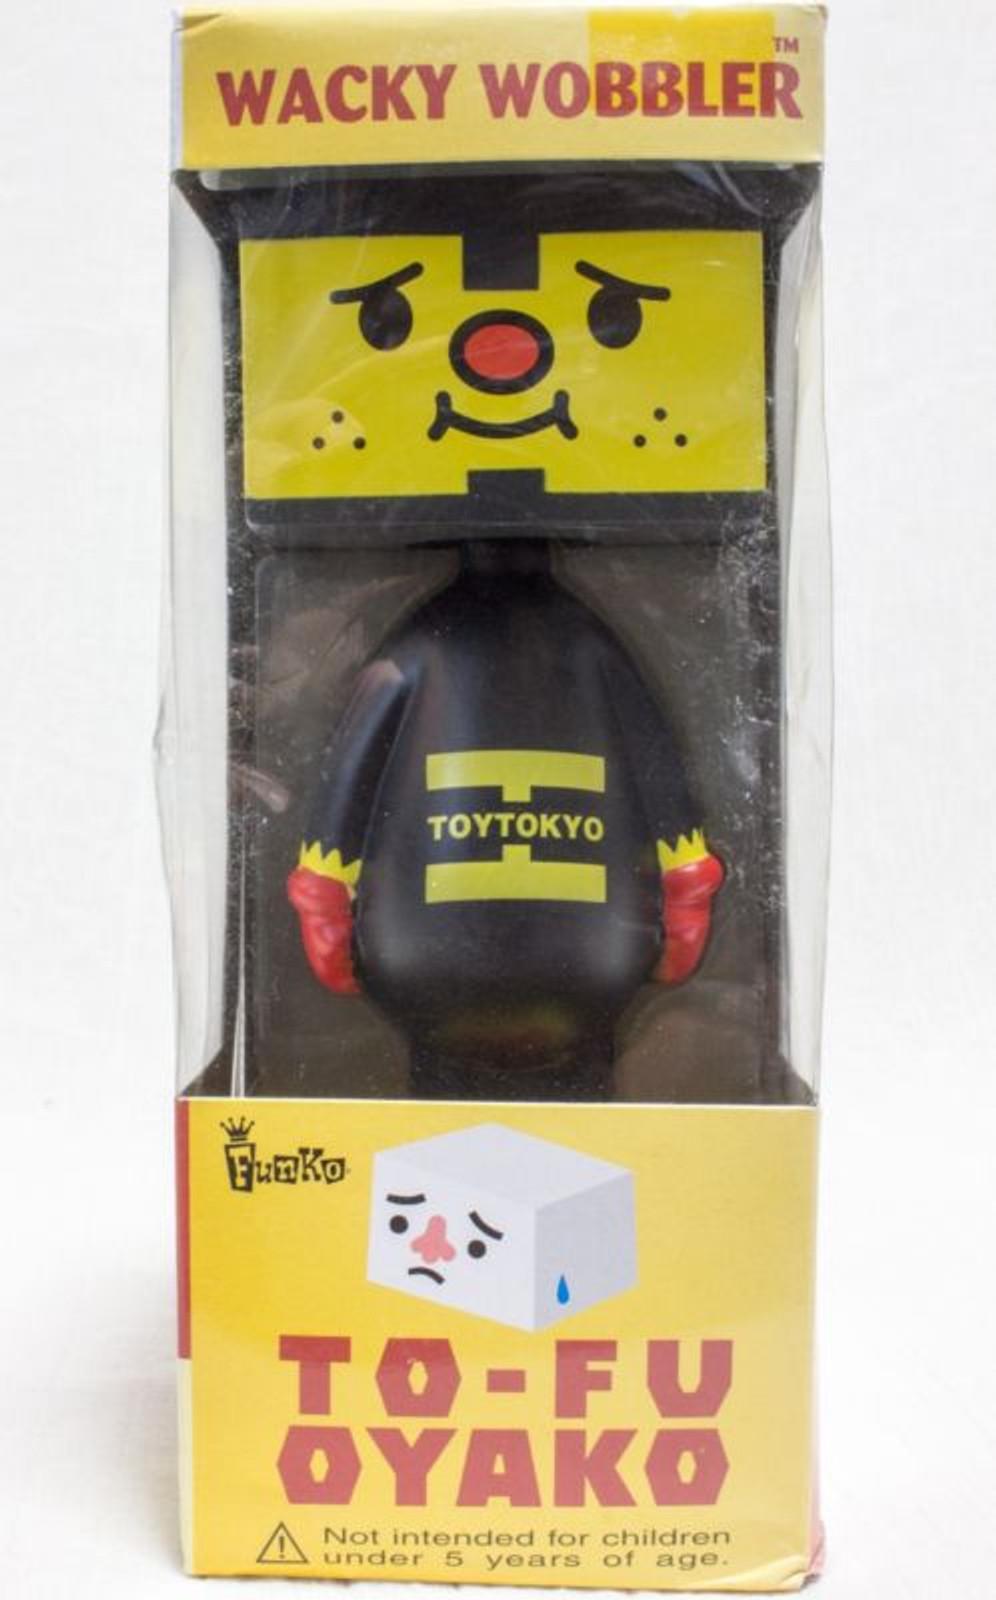 To-Fu Oyako Toy Tokyo Wacky Wobbler Bobble Head Figure Toy Funko Devilrobots